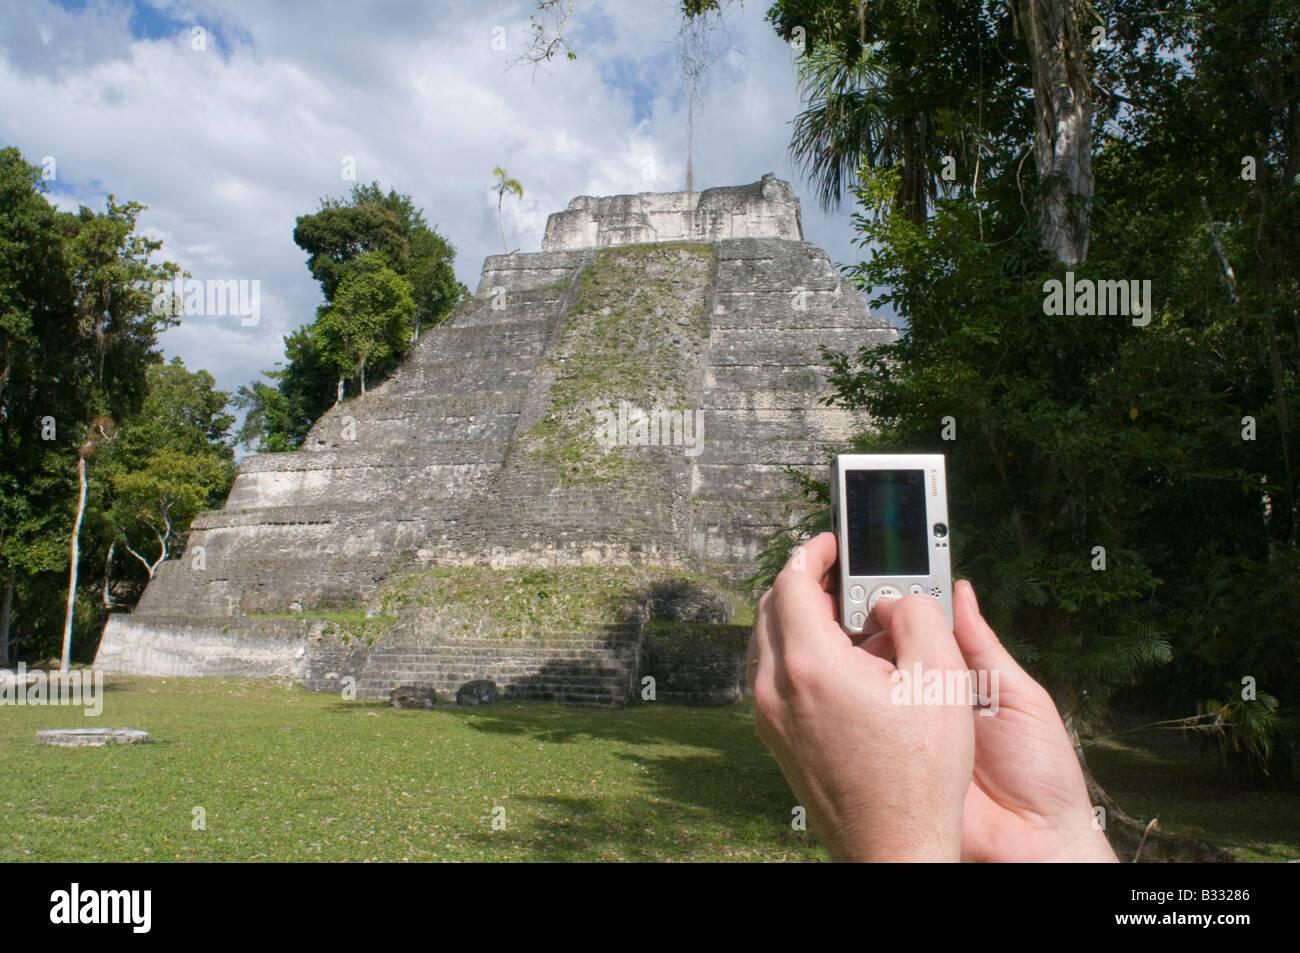 Tourist using a digital camera to photograph a Mayan temple at Yaxha nr Tikal Guatemala - Stock Image